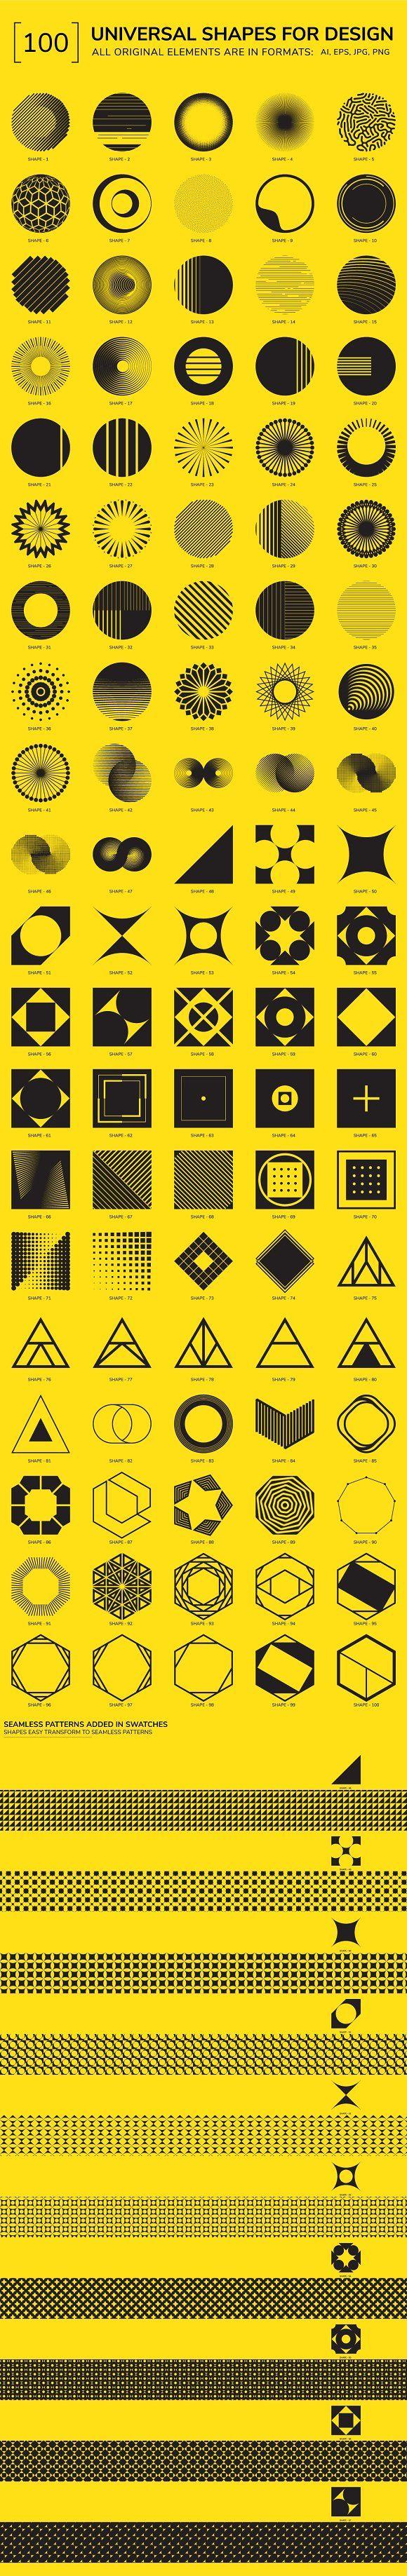 362 best Circles Around images on Pinterest